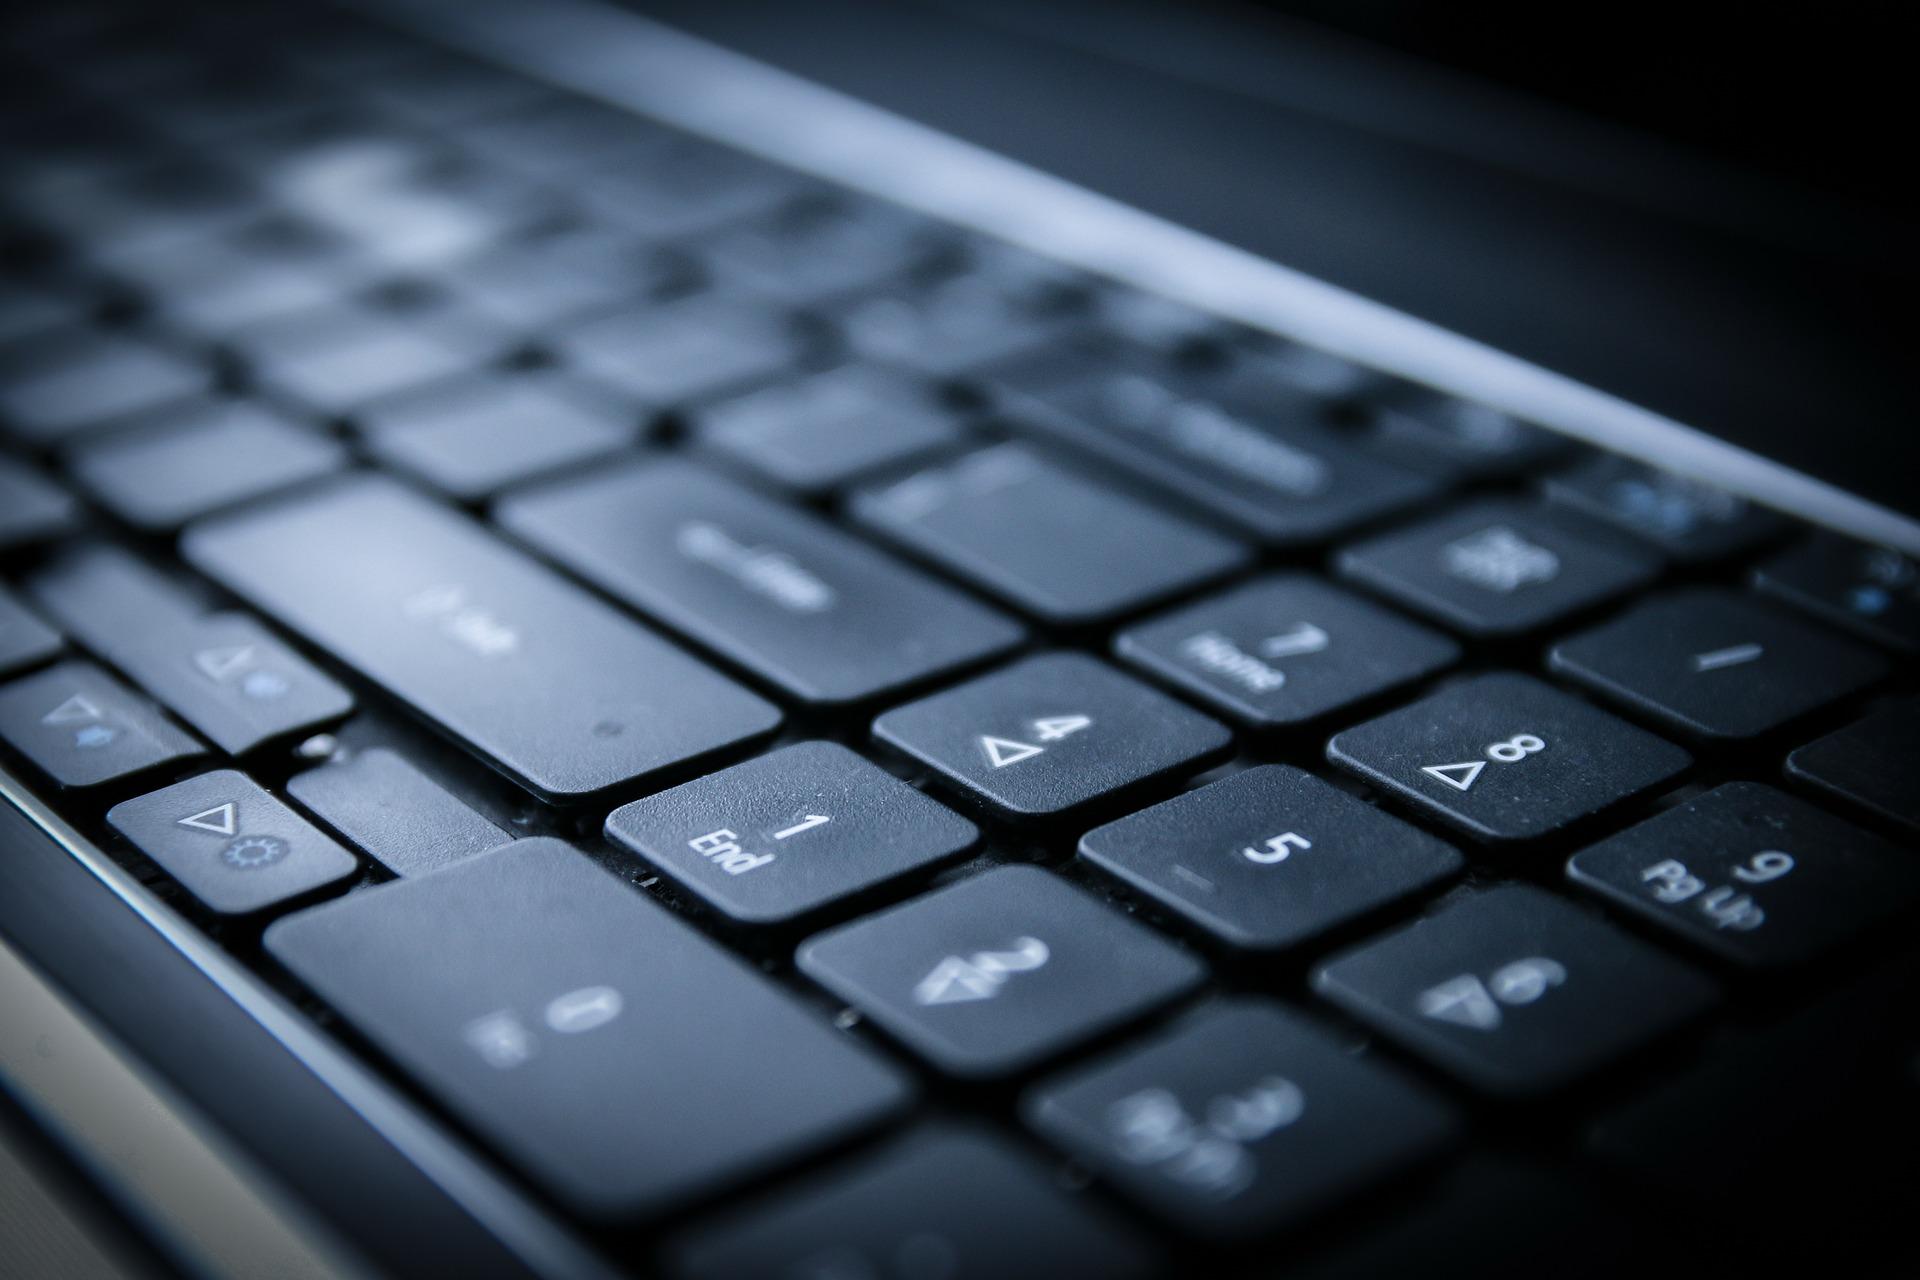 czarna klawiatura komputerowa